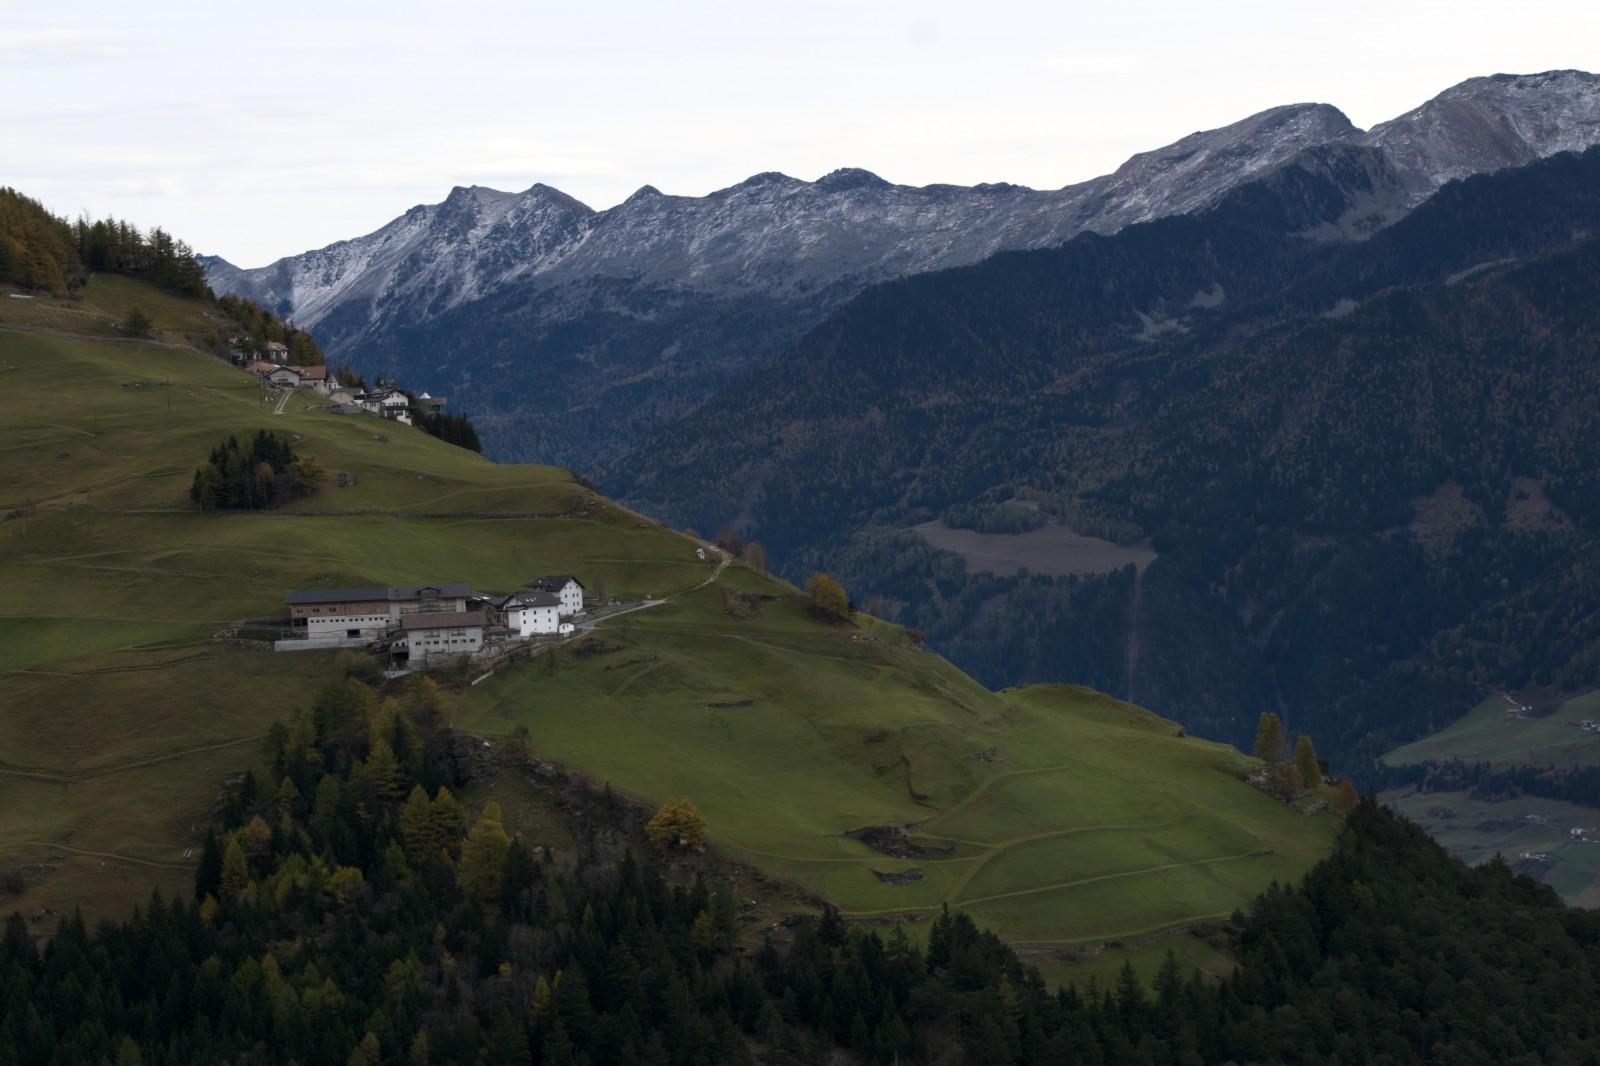 Ratschillhof